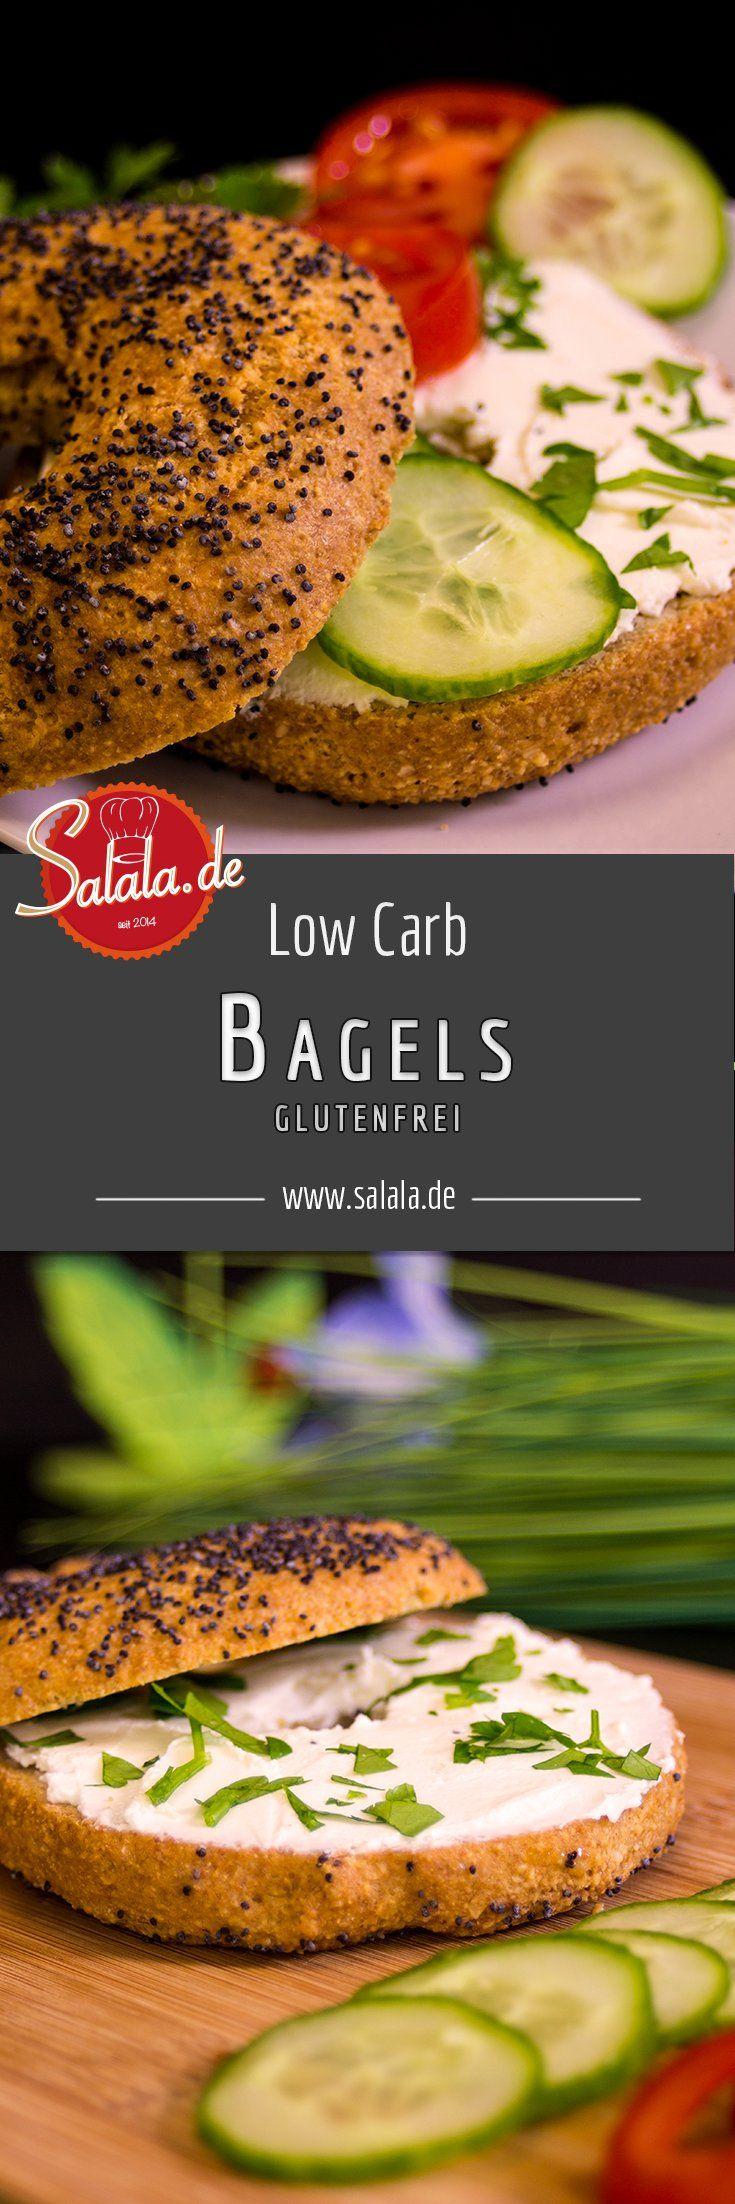 bagels paleo und low carb rezept low carb backen rezepte. Black Bedroom Furniture Sets. Home Design Ideas